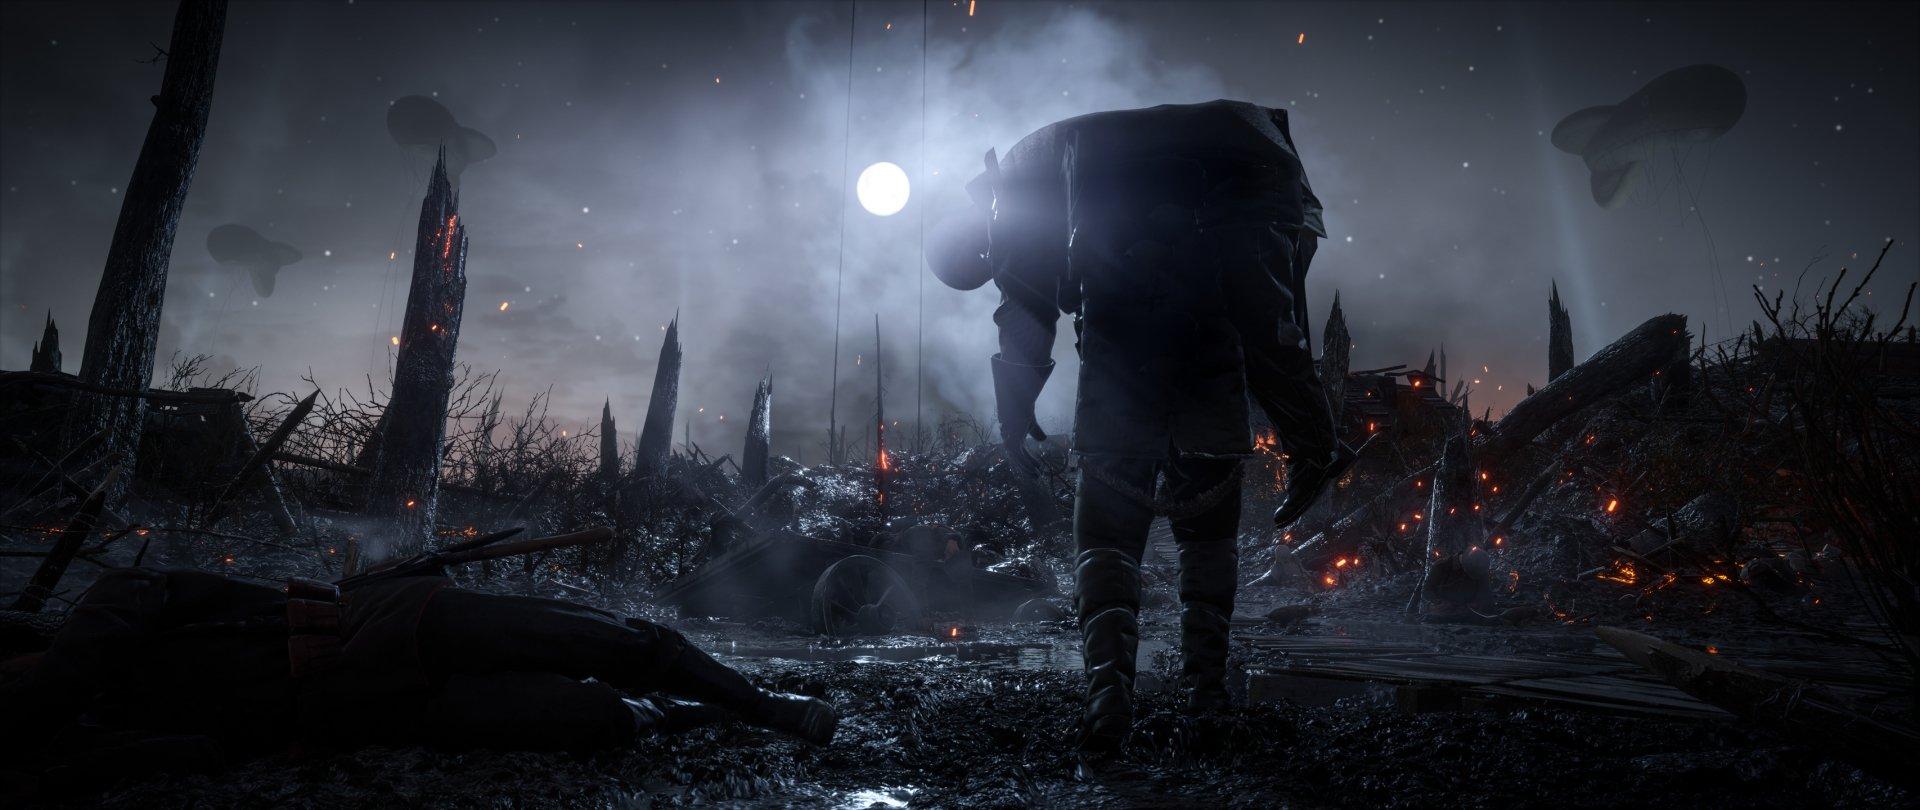 Battlefield 1 HD Wallpaper   Background Image   3413x1440 ...